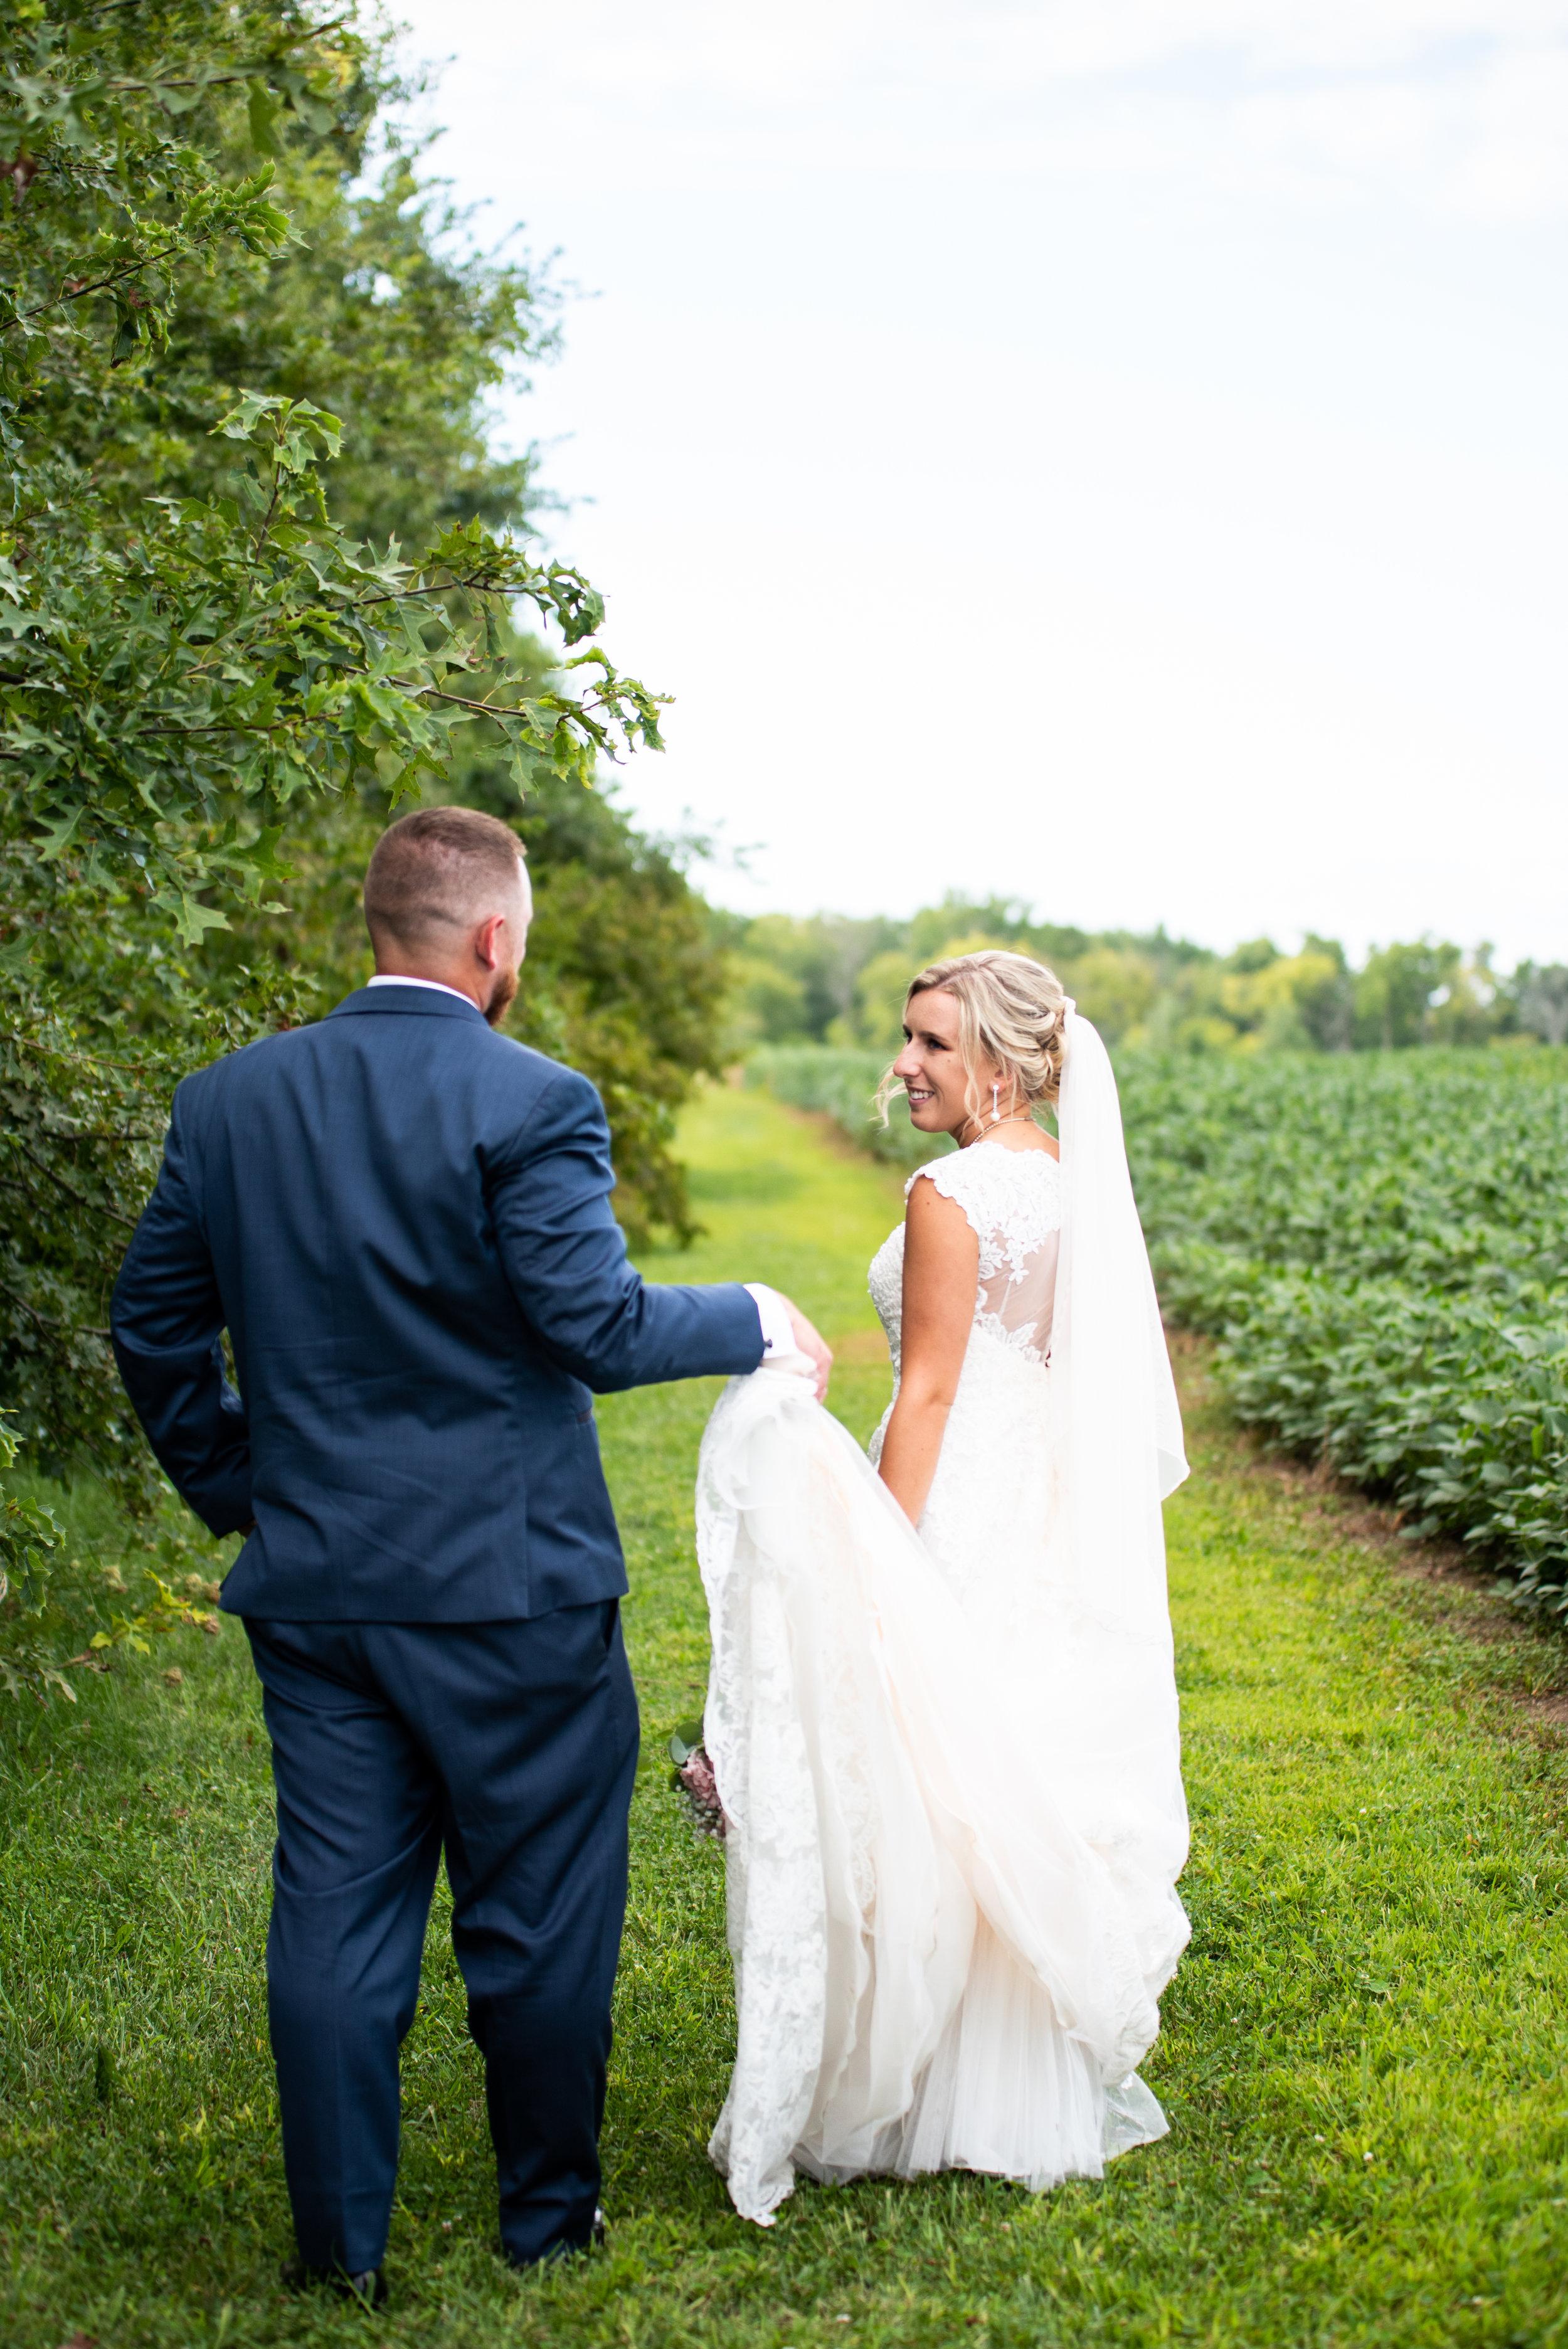 wedding (1 of 1)-142.jpg